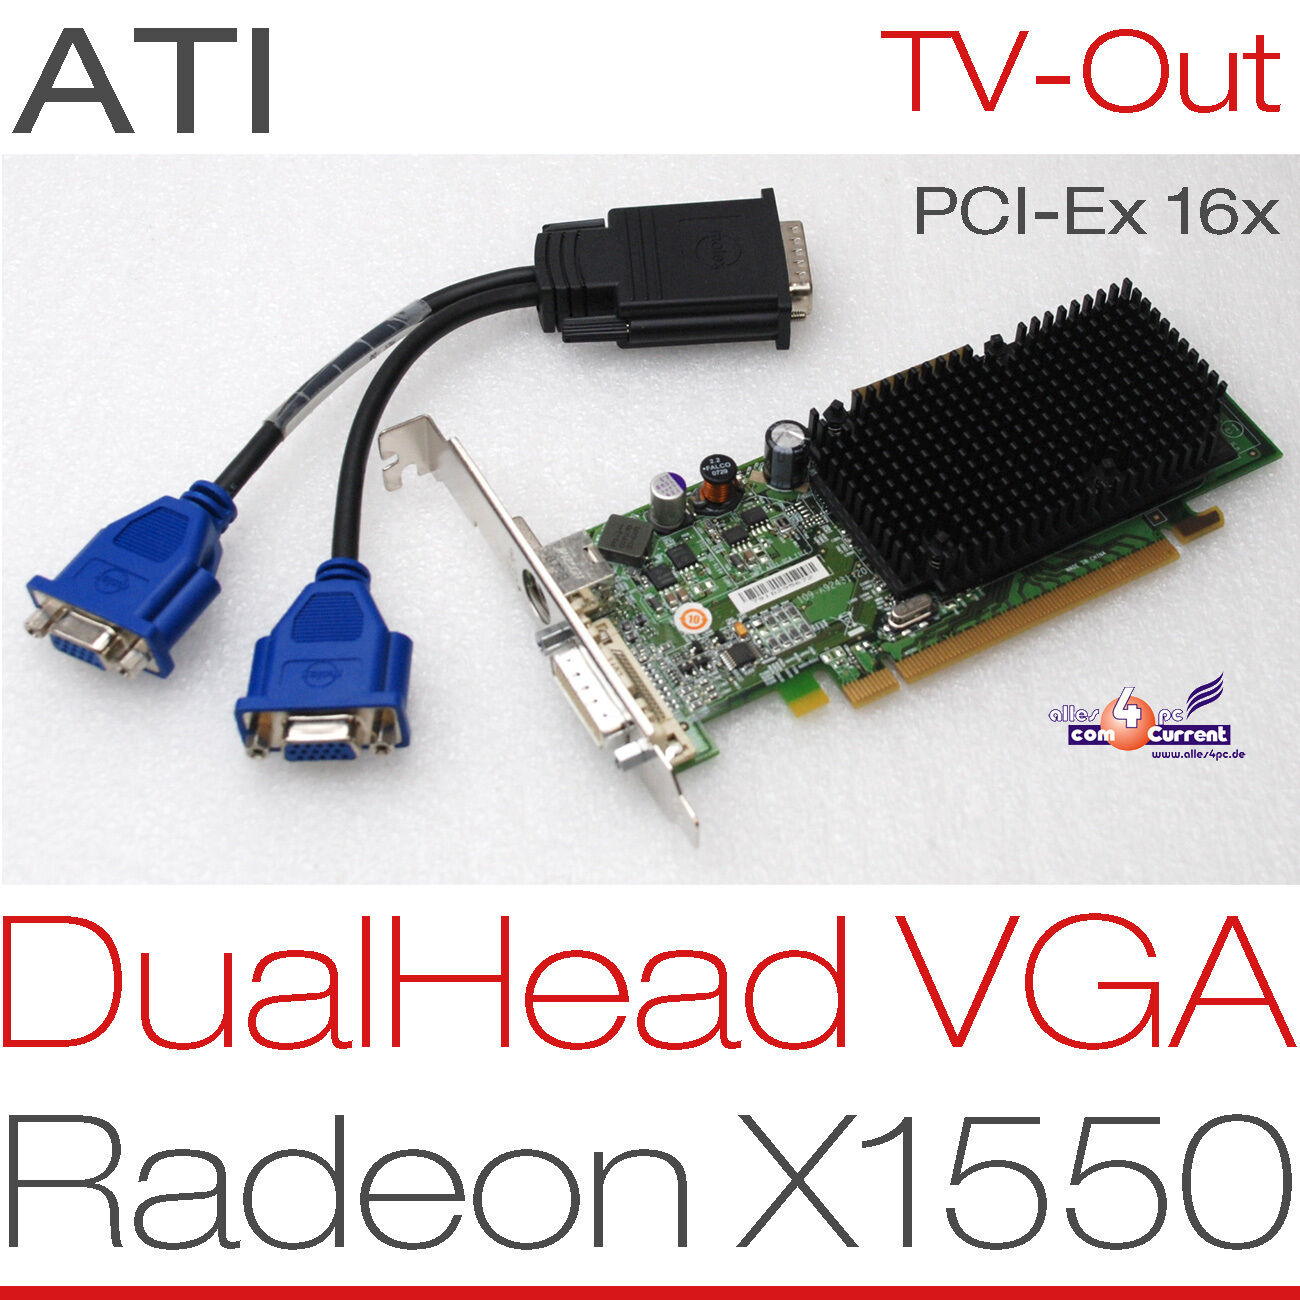 256 MB ATI Radeon X1550 RV516 Pcie Dual Head 2x VGA Graphic Card Win XP 7 8 -G12